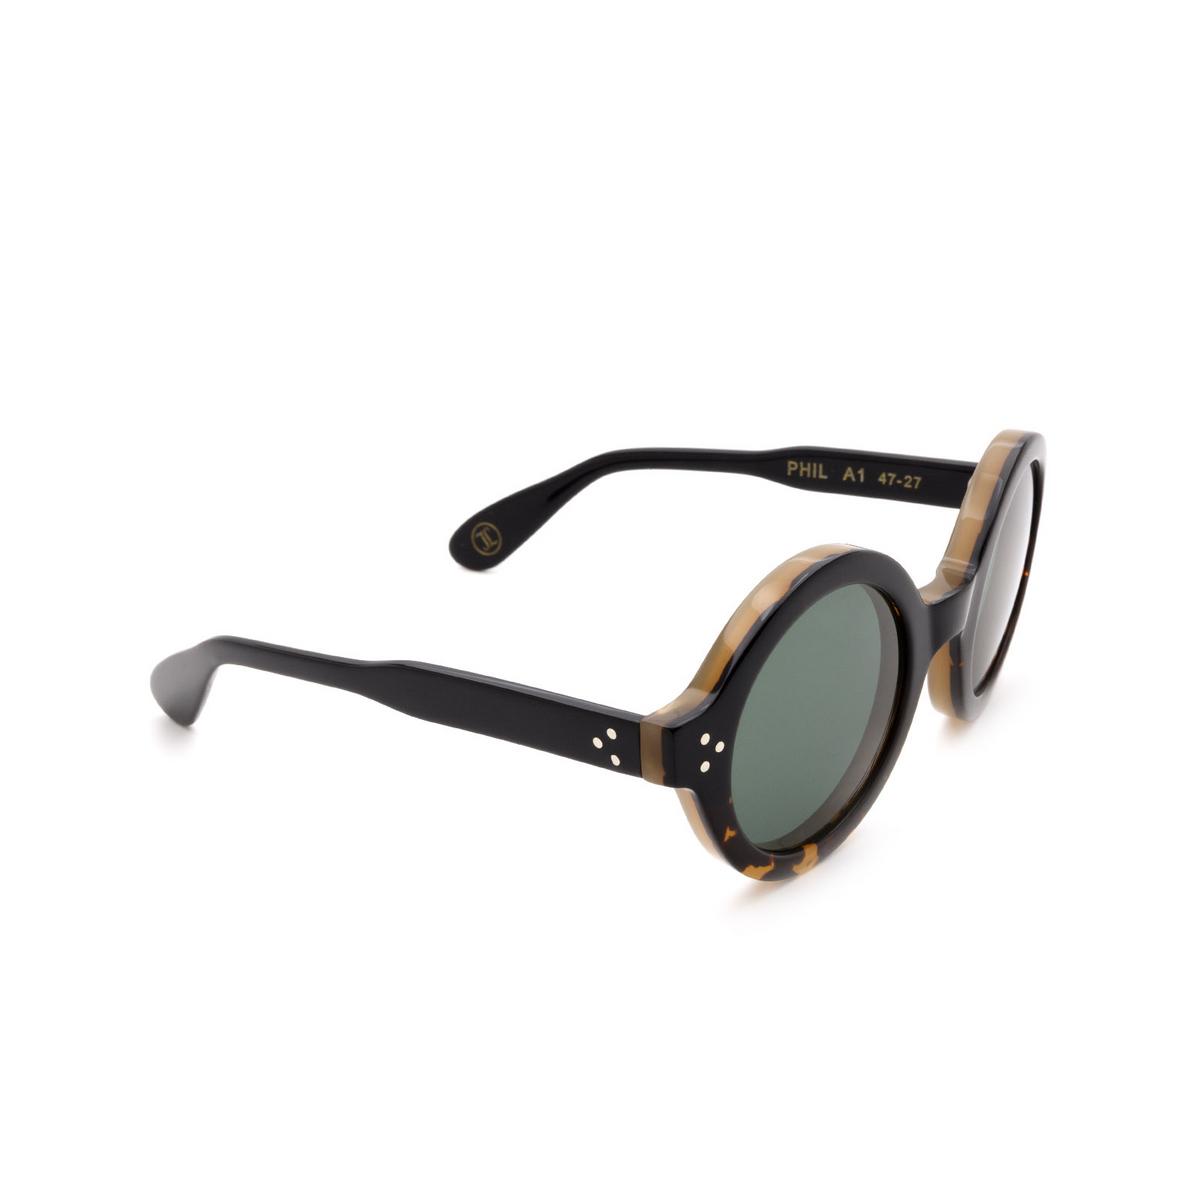 Lesca® Round Sunglasses: Phil Sun color Dark Havana A1 - three-quarters view.